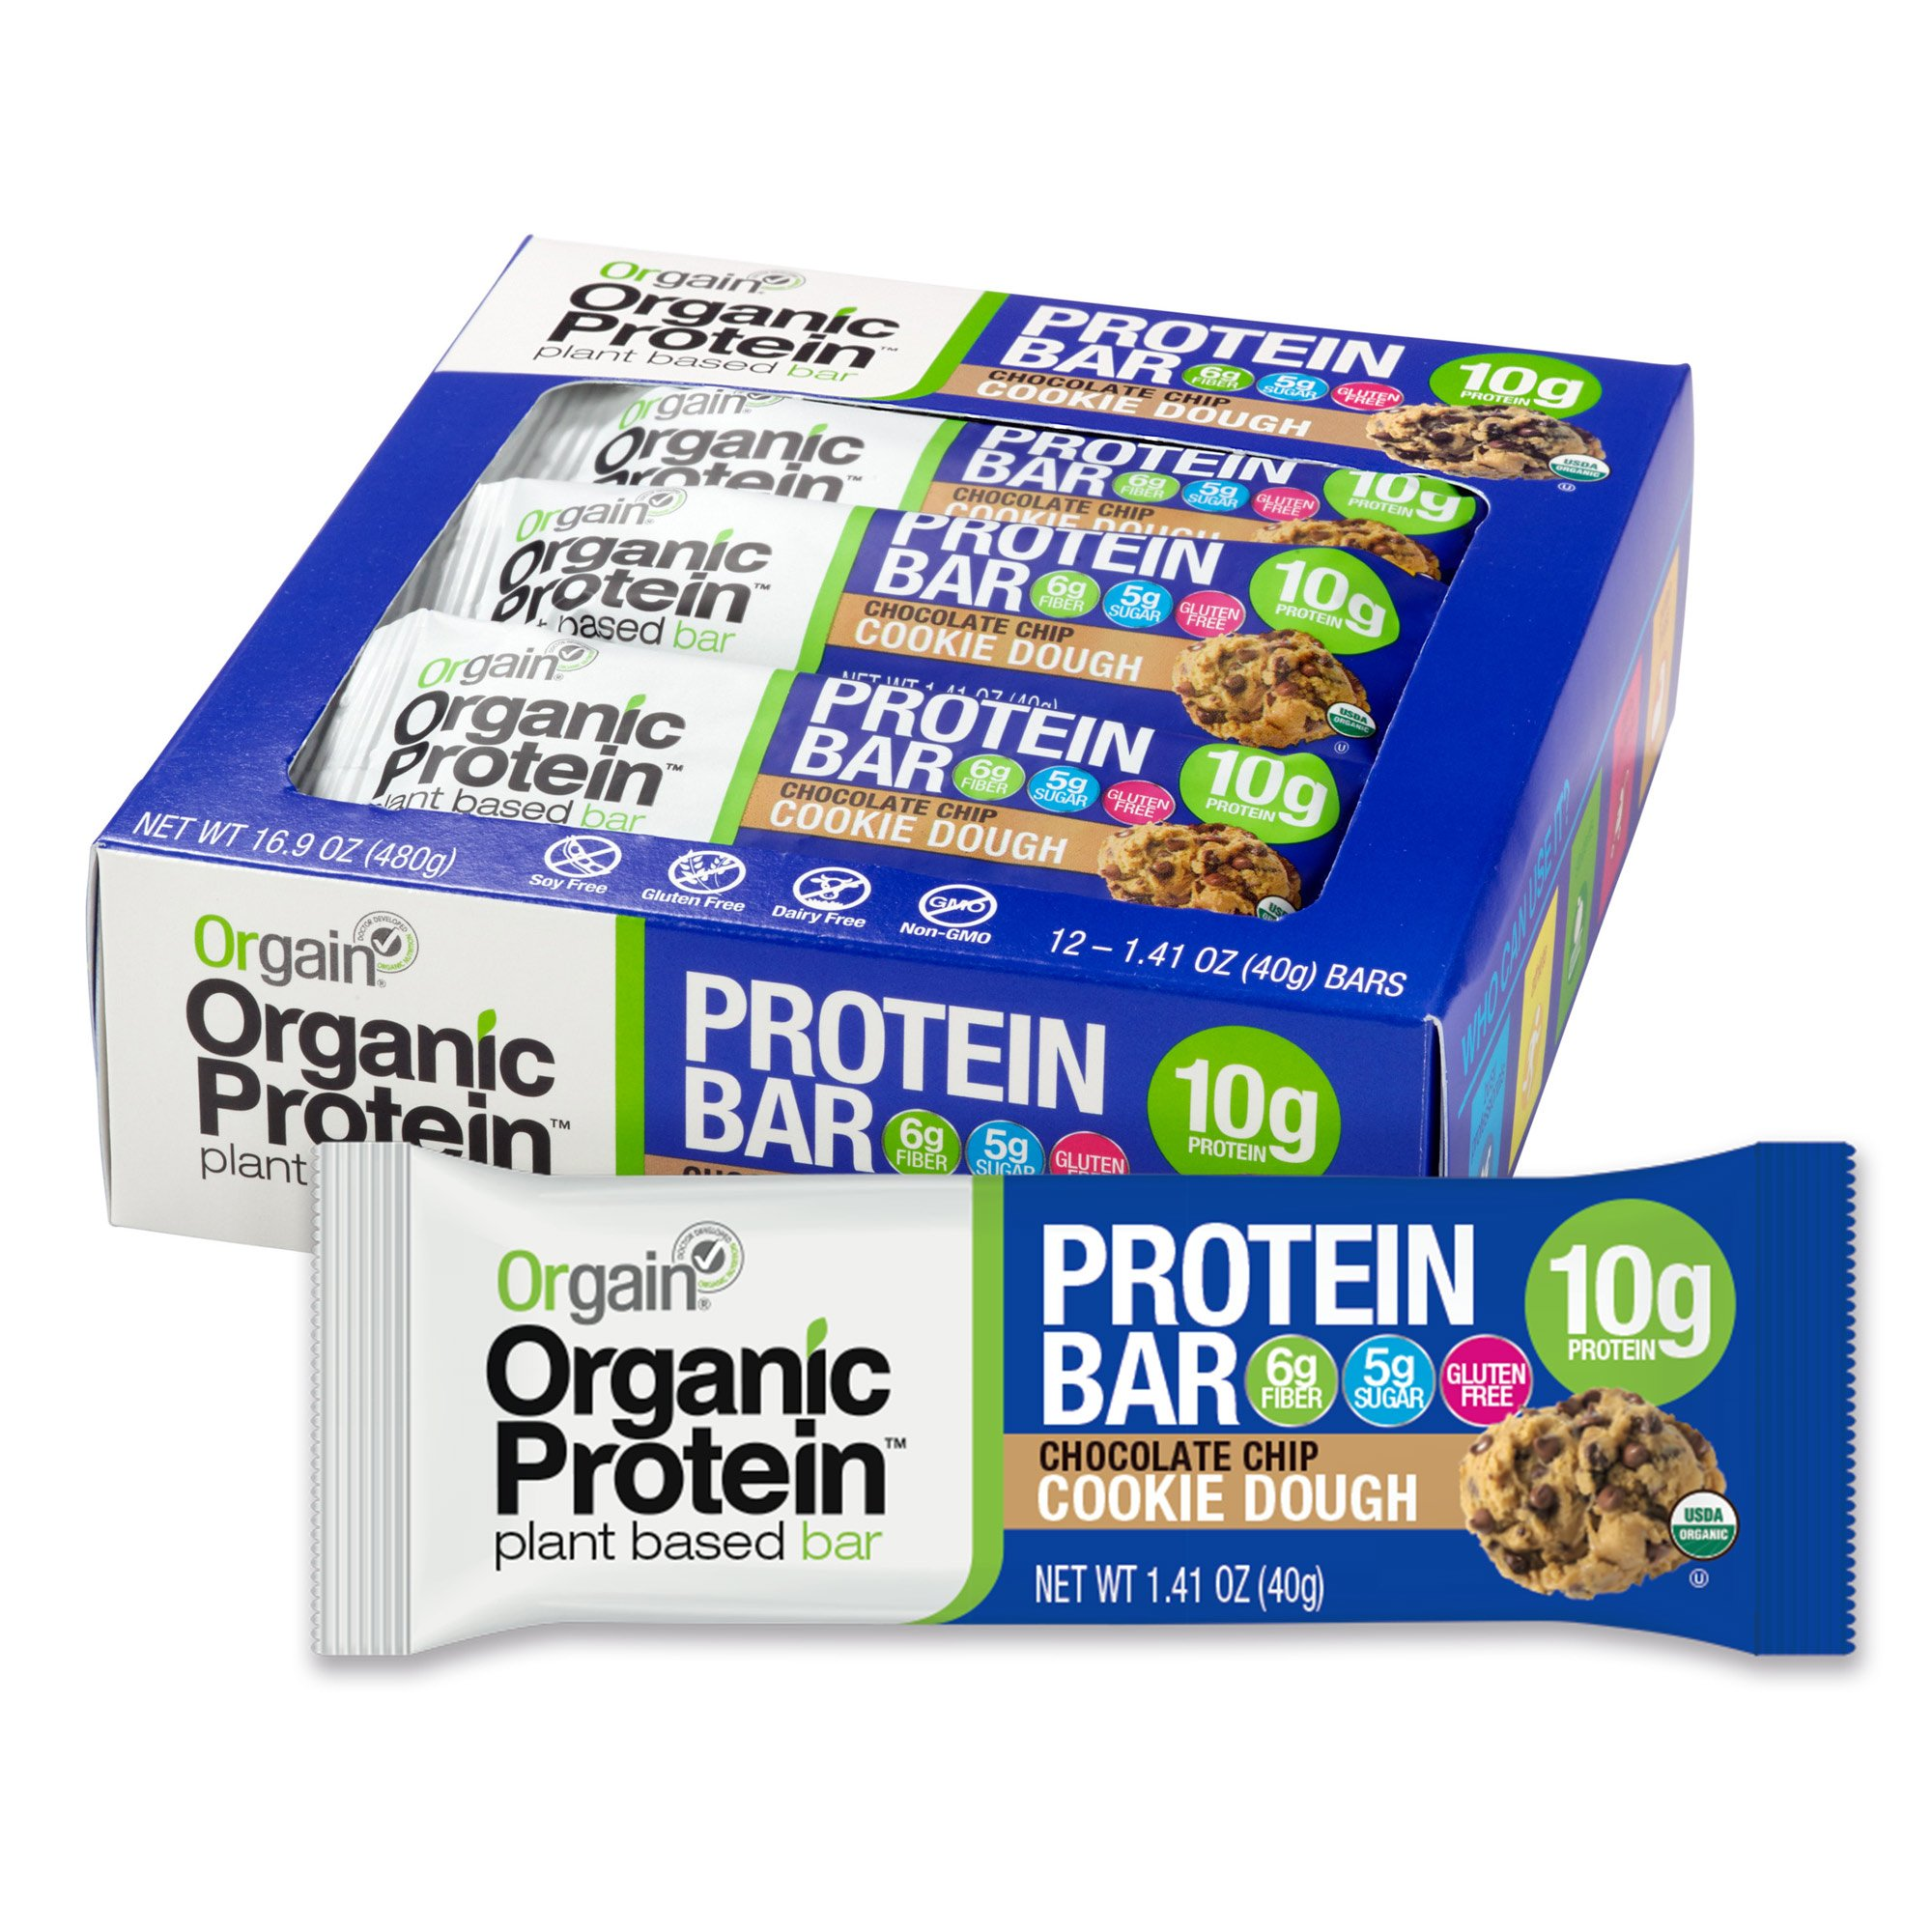 Orgain Organic Protein Bar, Chocolate Chip Cookie Dough, Gluten Free, Non-GMO, USDA Organic, 1.41 Ounce, 12 Count